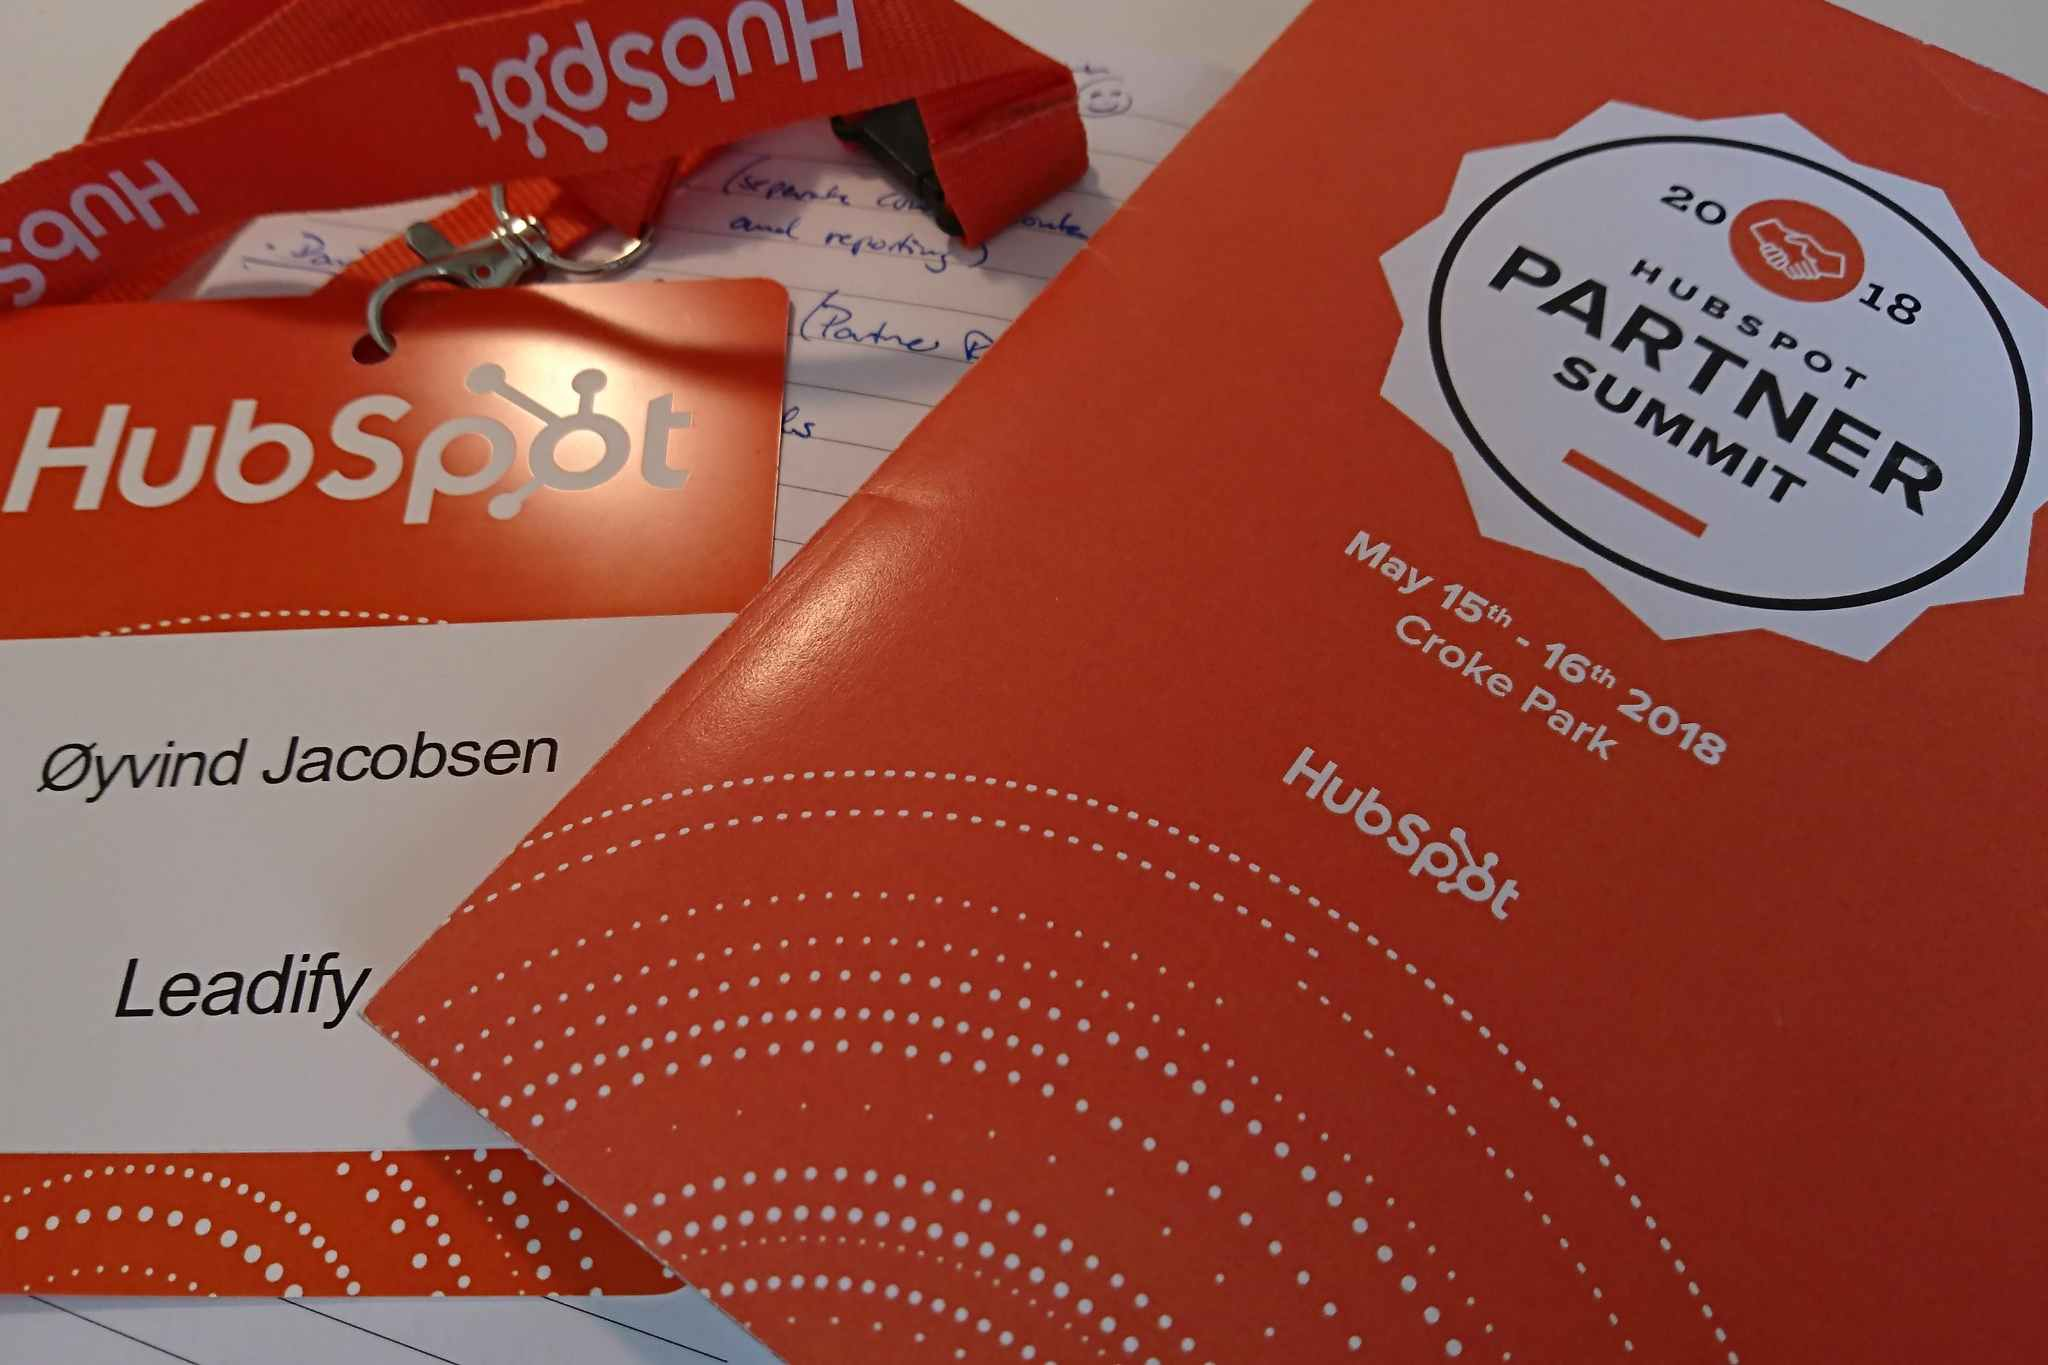 HubSpot PartnerSummit 2018